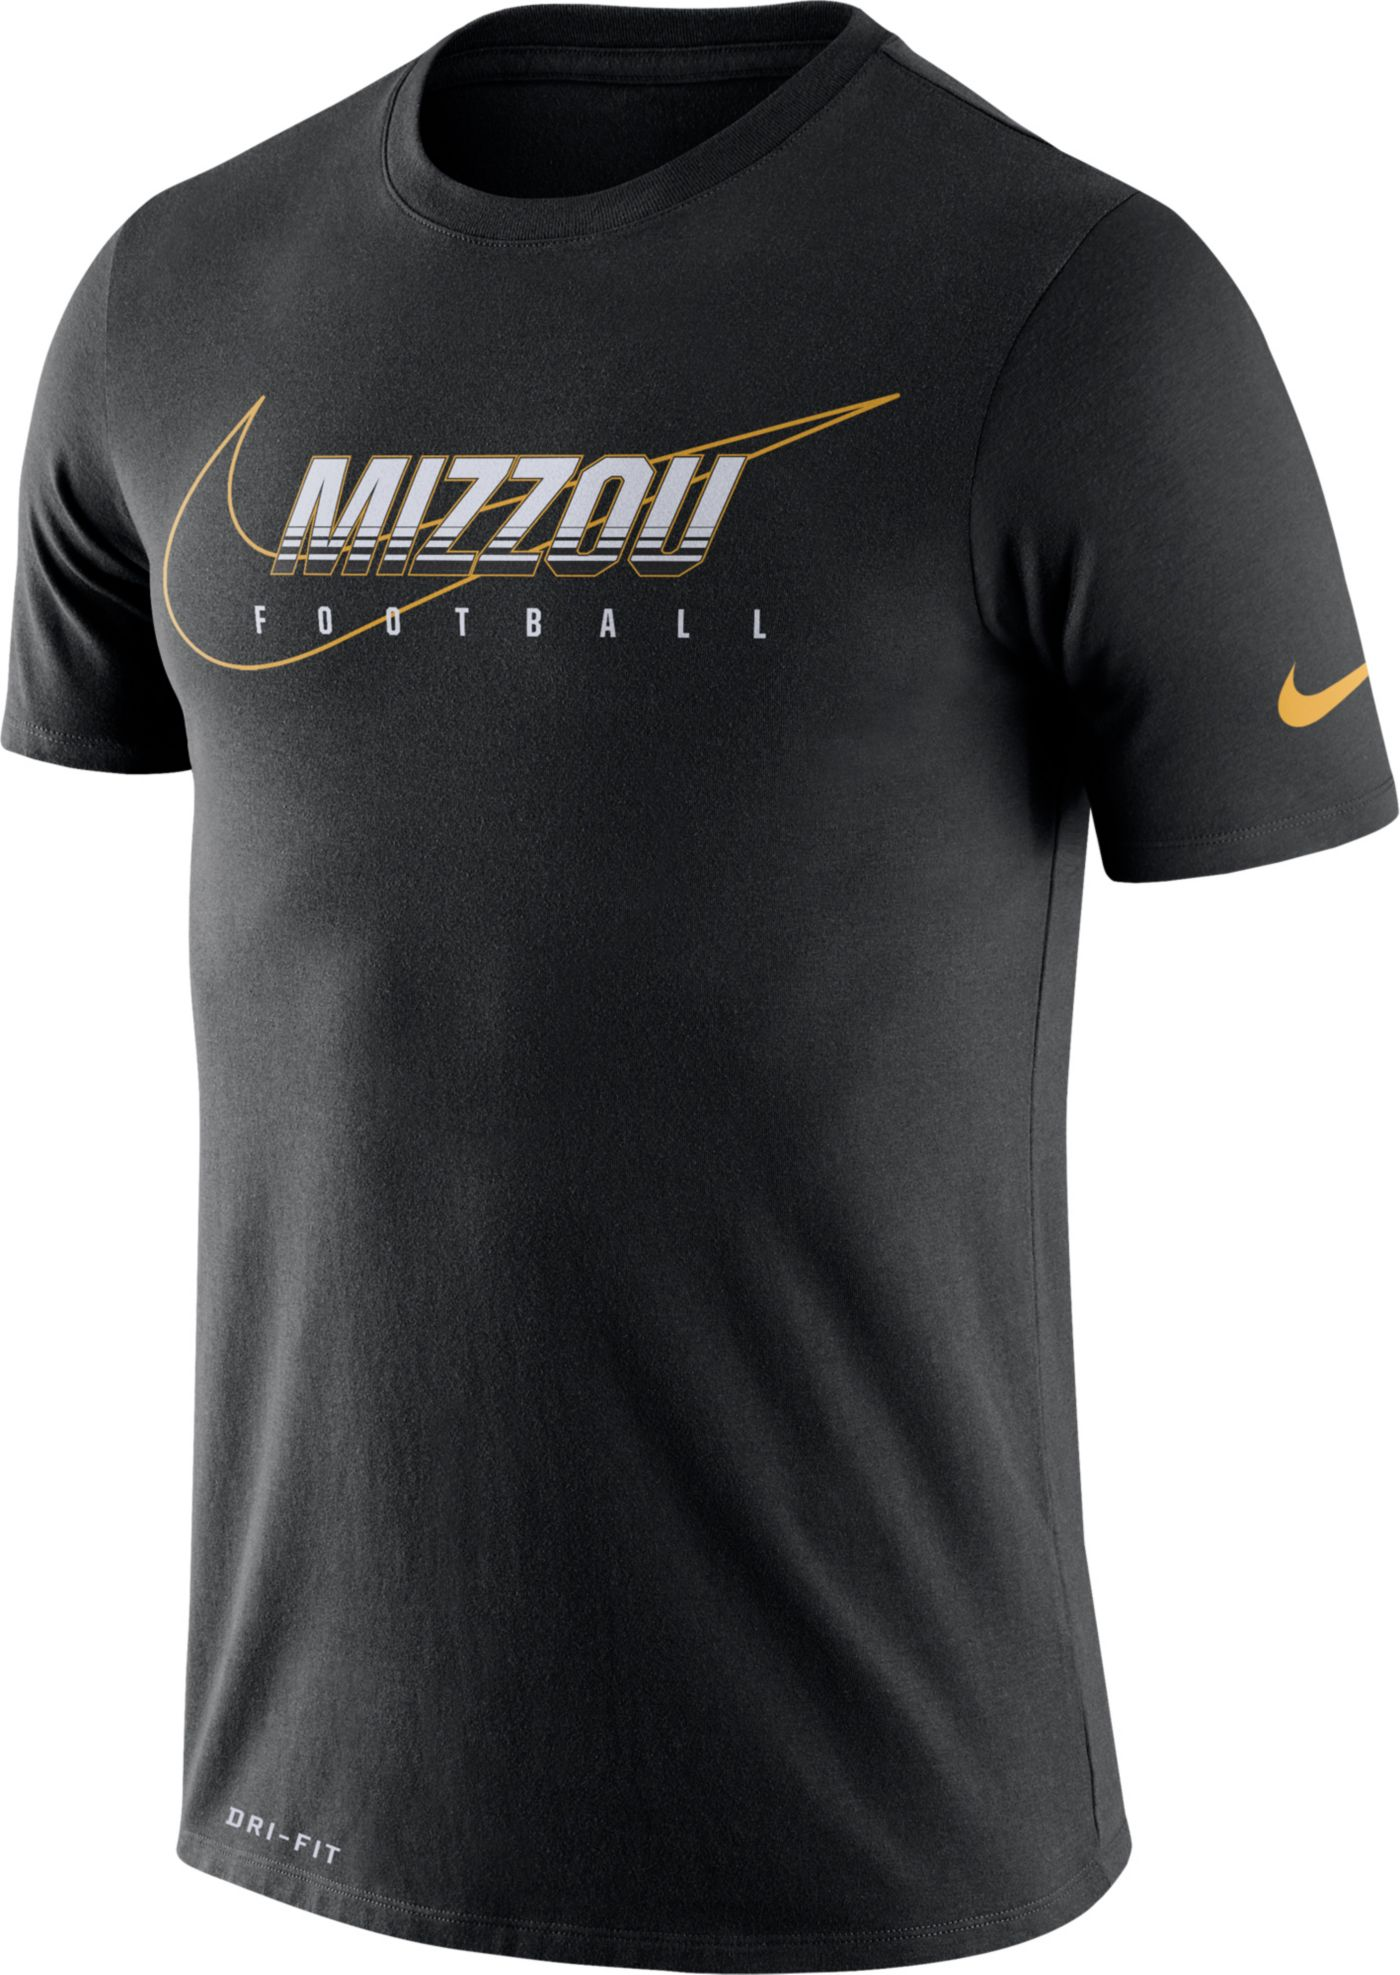 Nike Men's Missouri Tigers Football Dri-FIT Cotton Facility Black T-Shirt